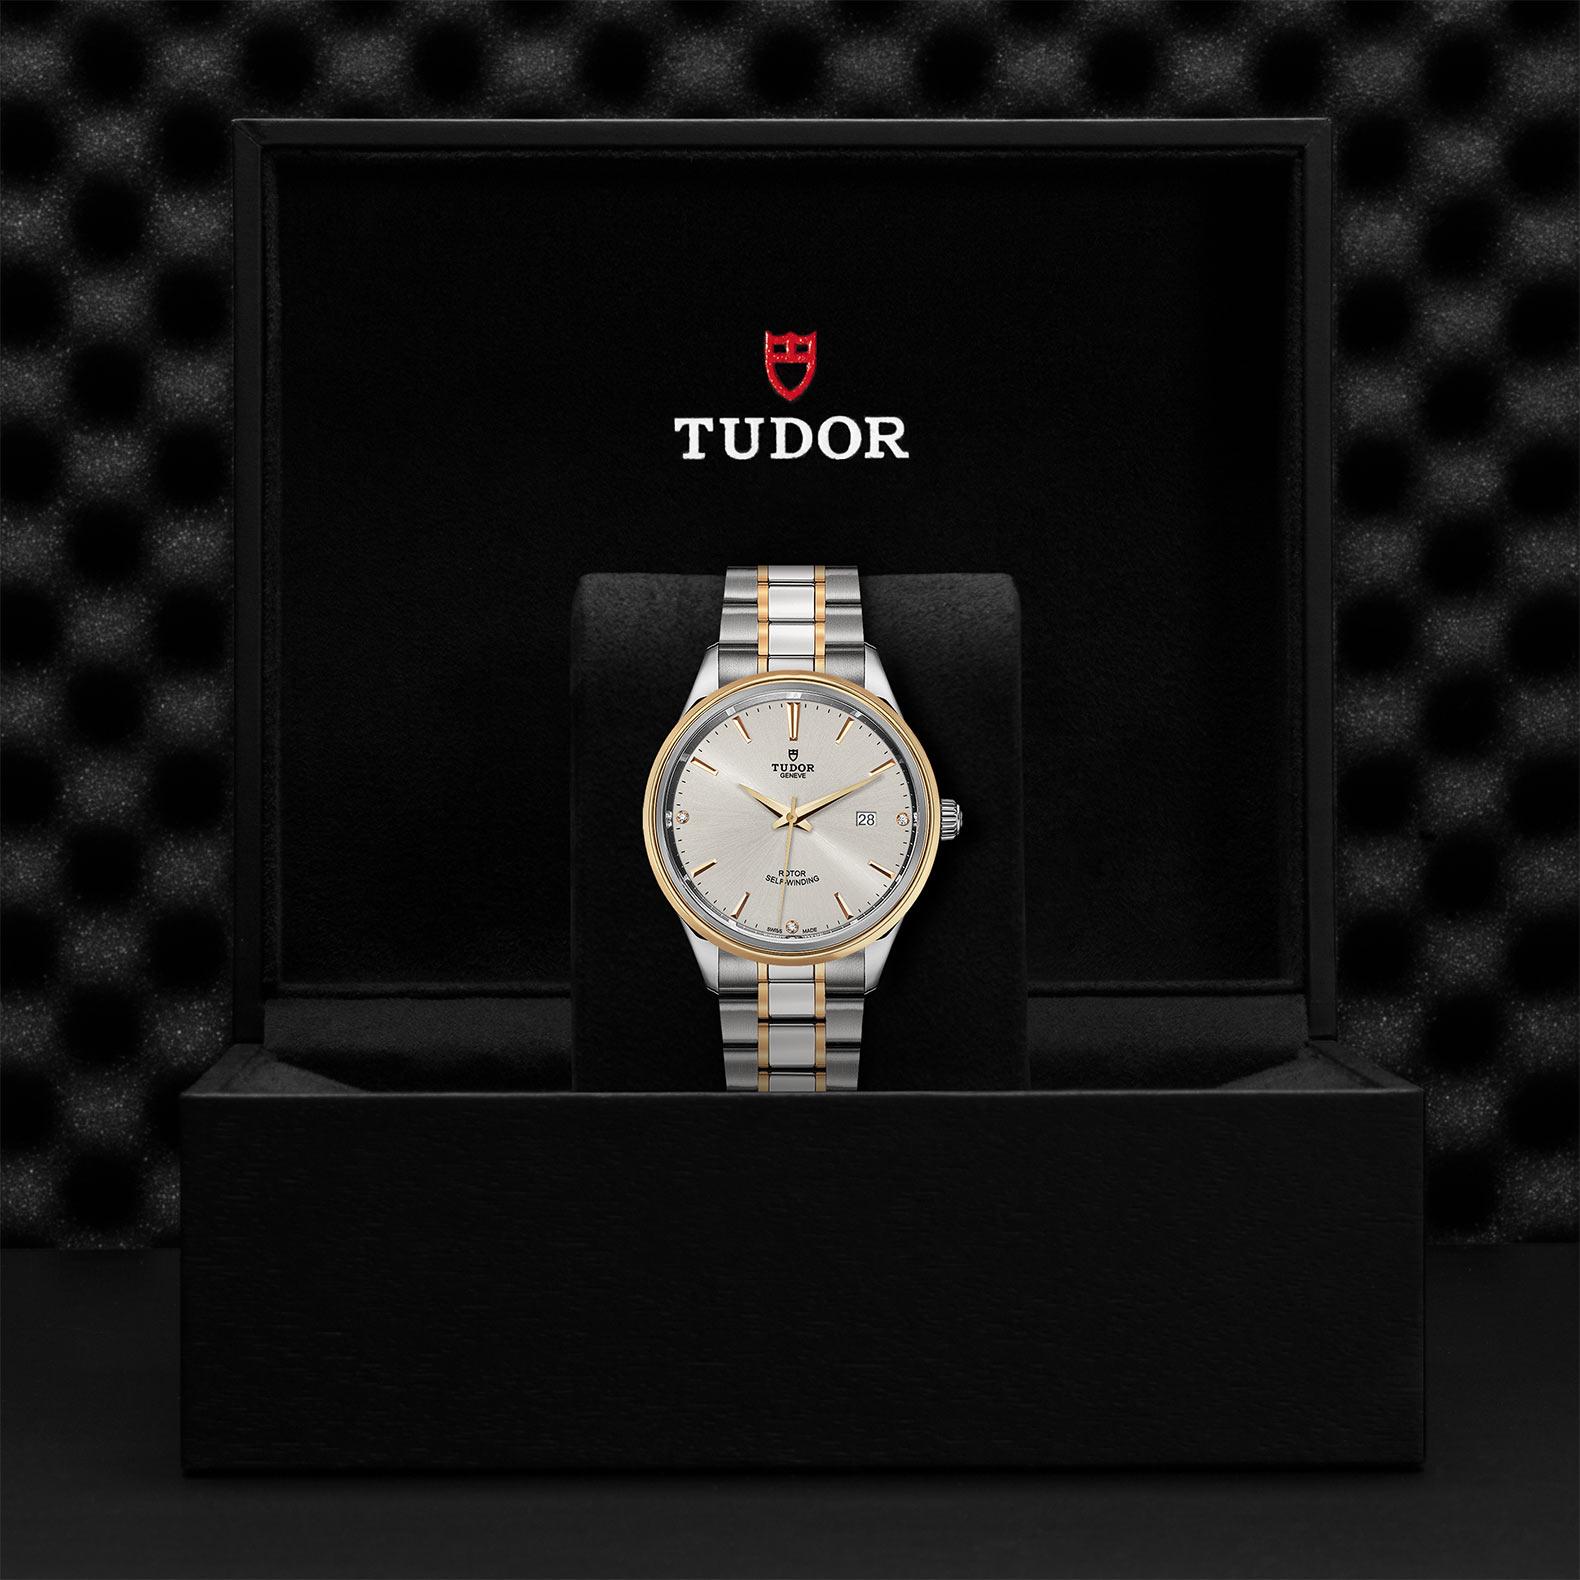 TUDOR Style M12703 0005 Presentationbox